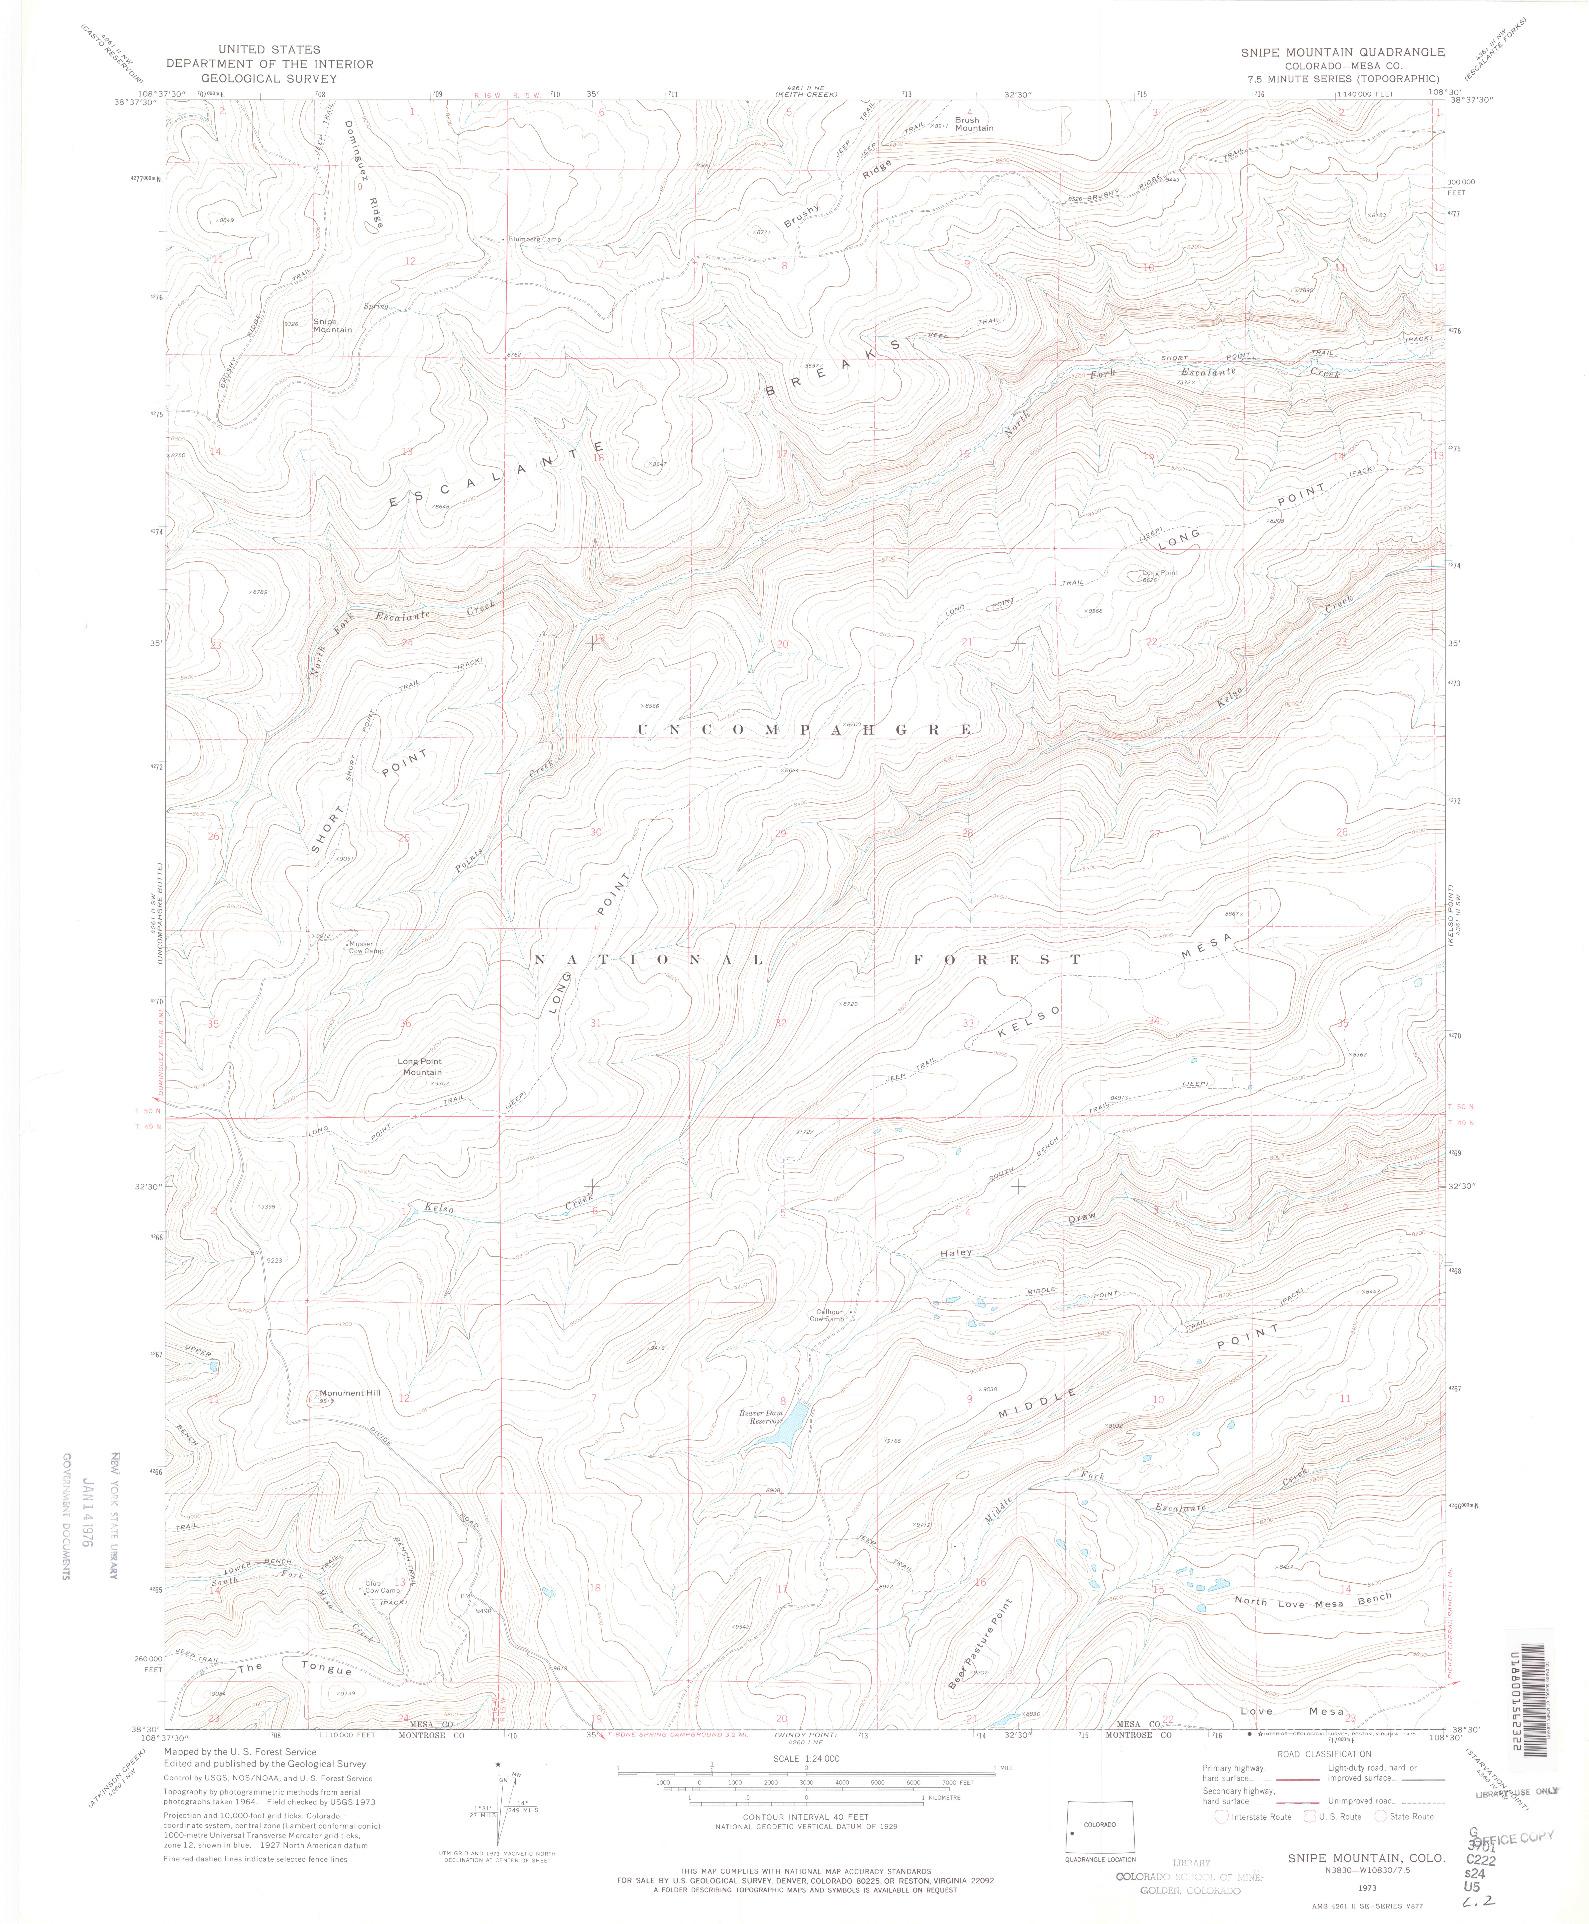 USGS 1:24000-SCALE QUADRANGLE FOR SNIPE MOUNTAIN, CO 1973